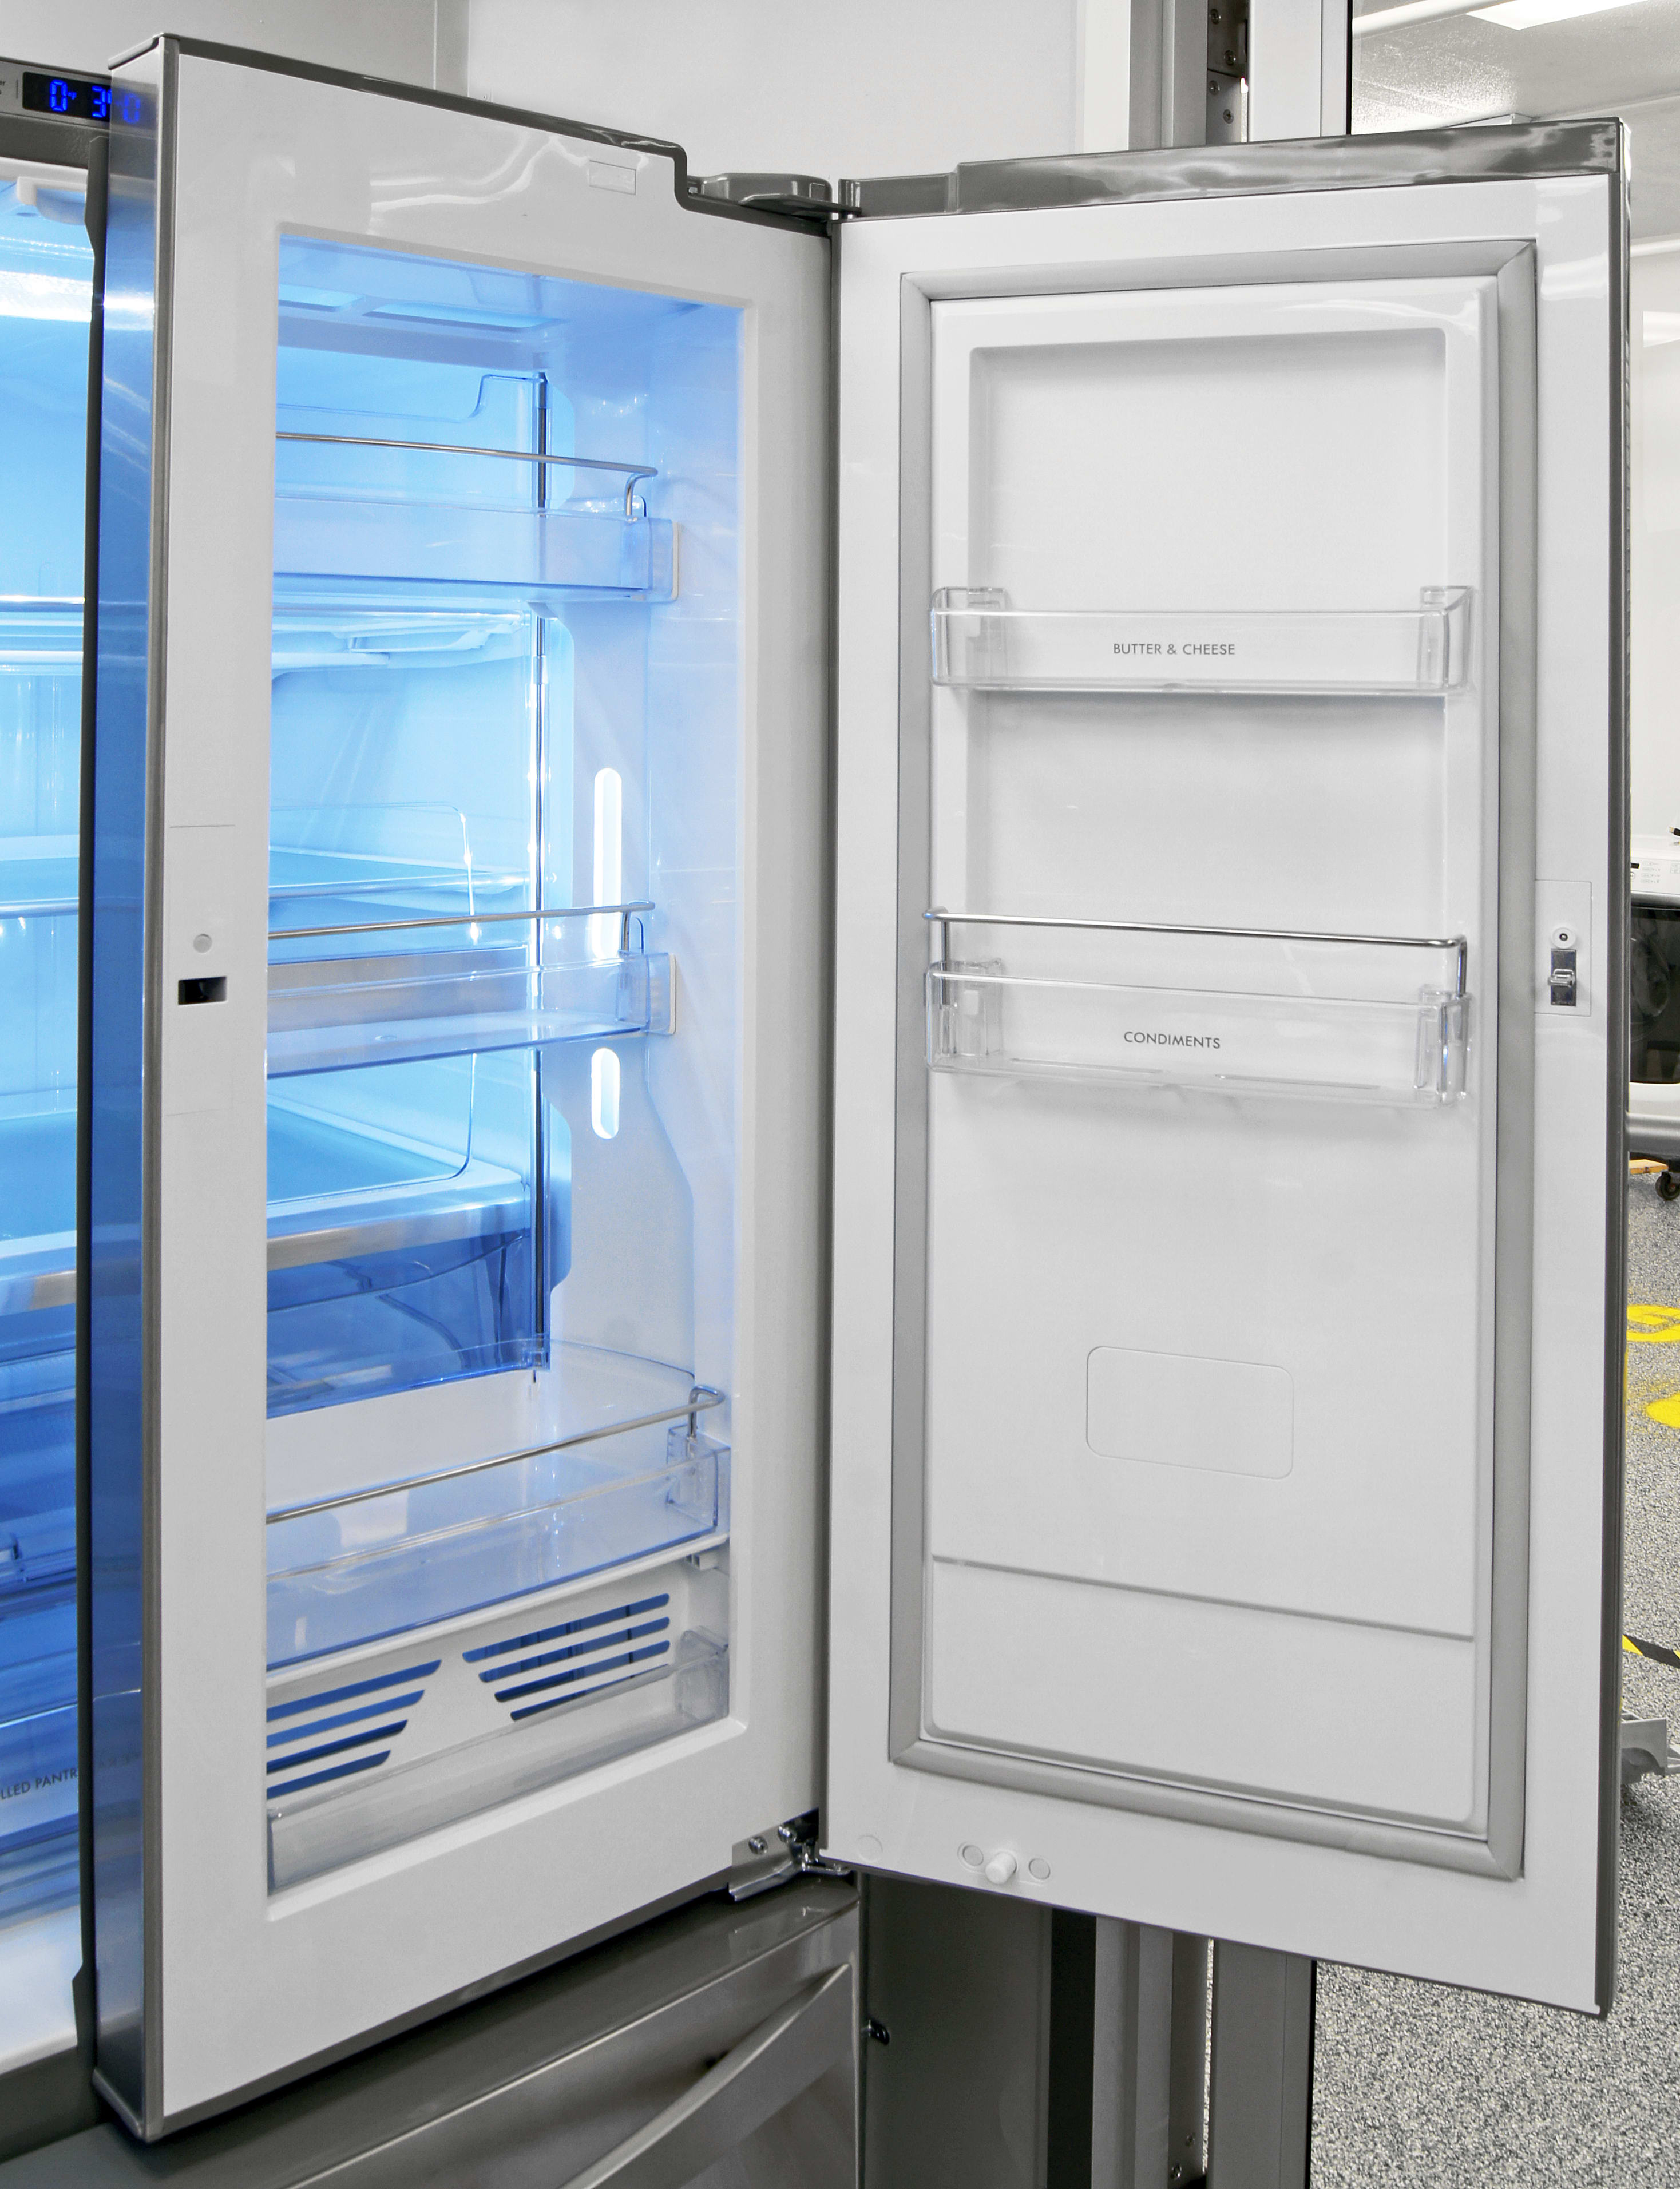 Kenmore Counter Depth French Door Refrigerator 36 Kenmore 50022